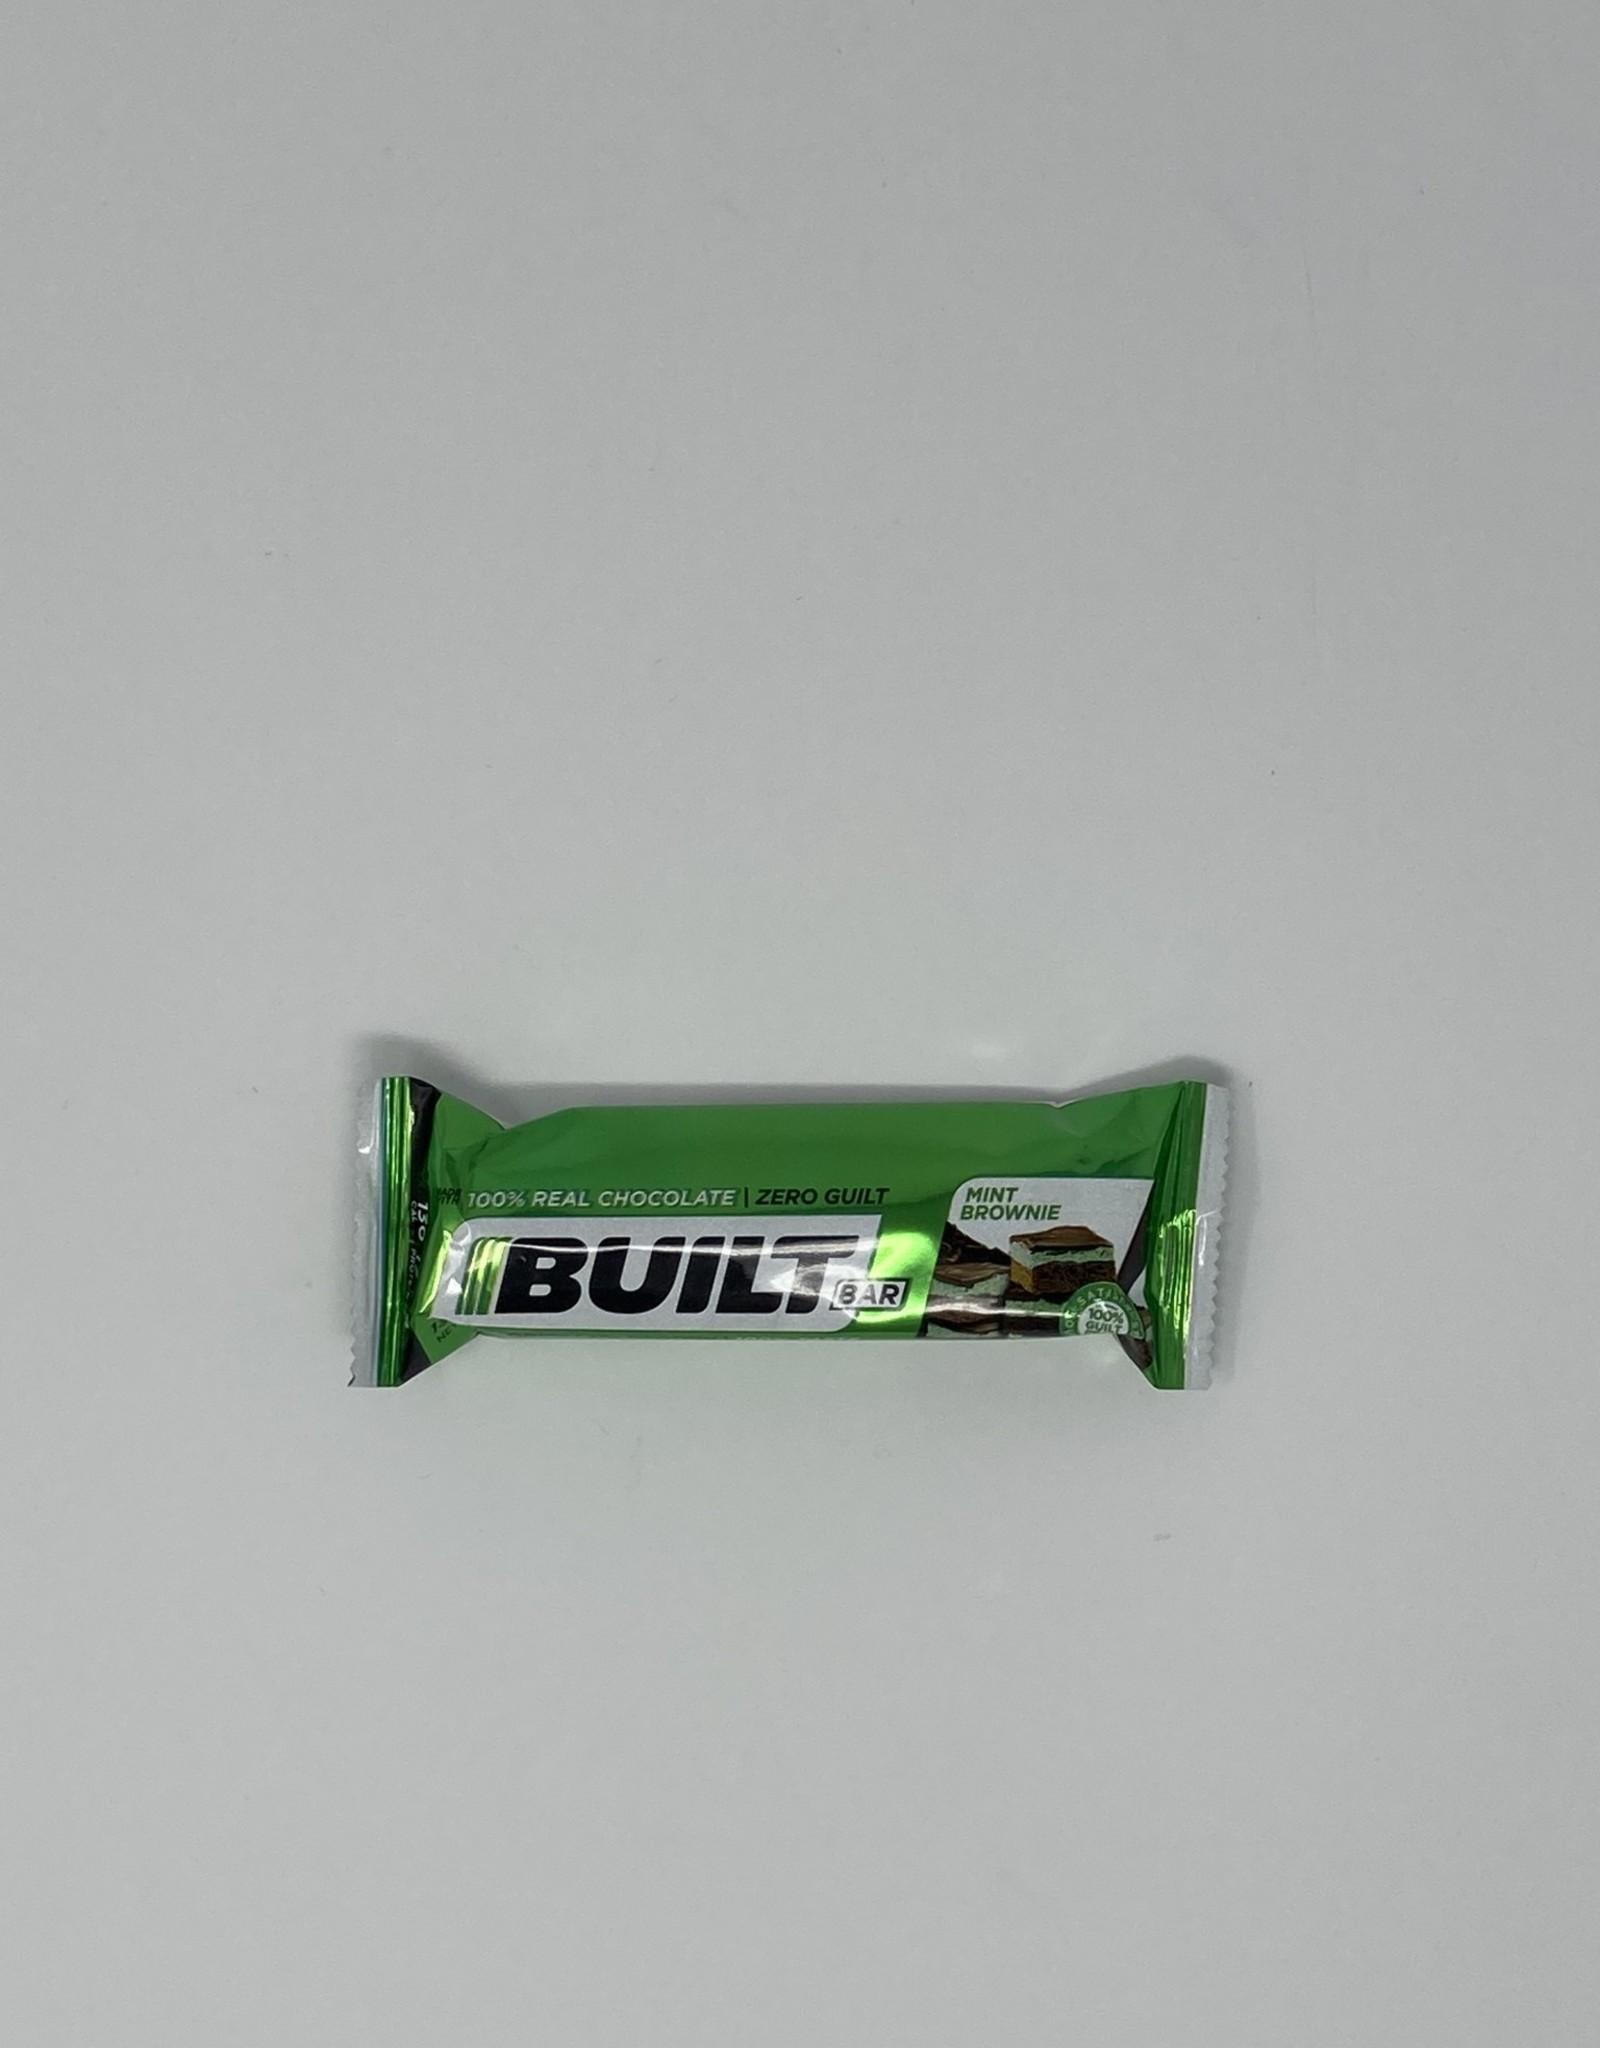 Built Bar Built Bar - Mint Brownie